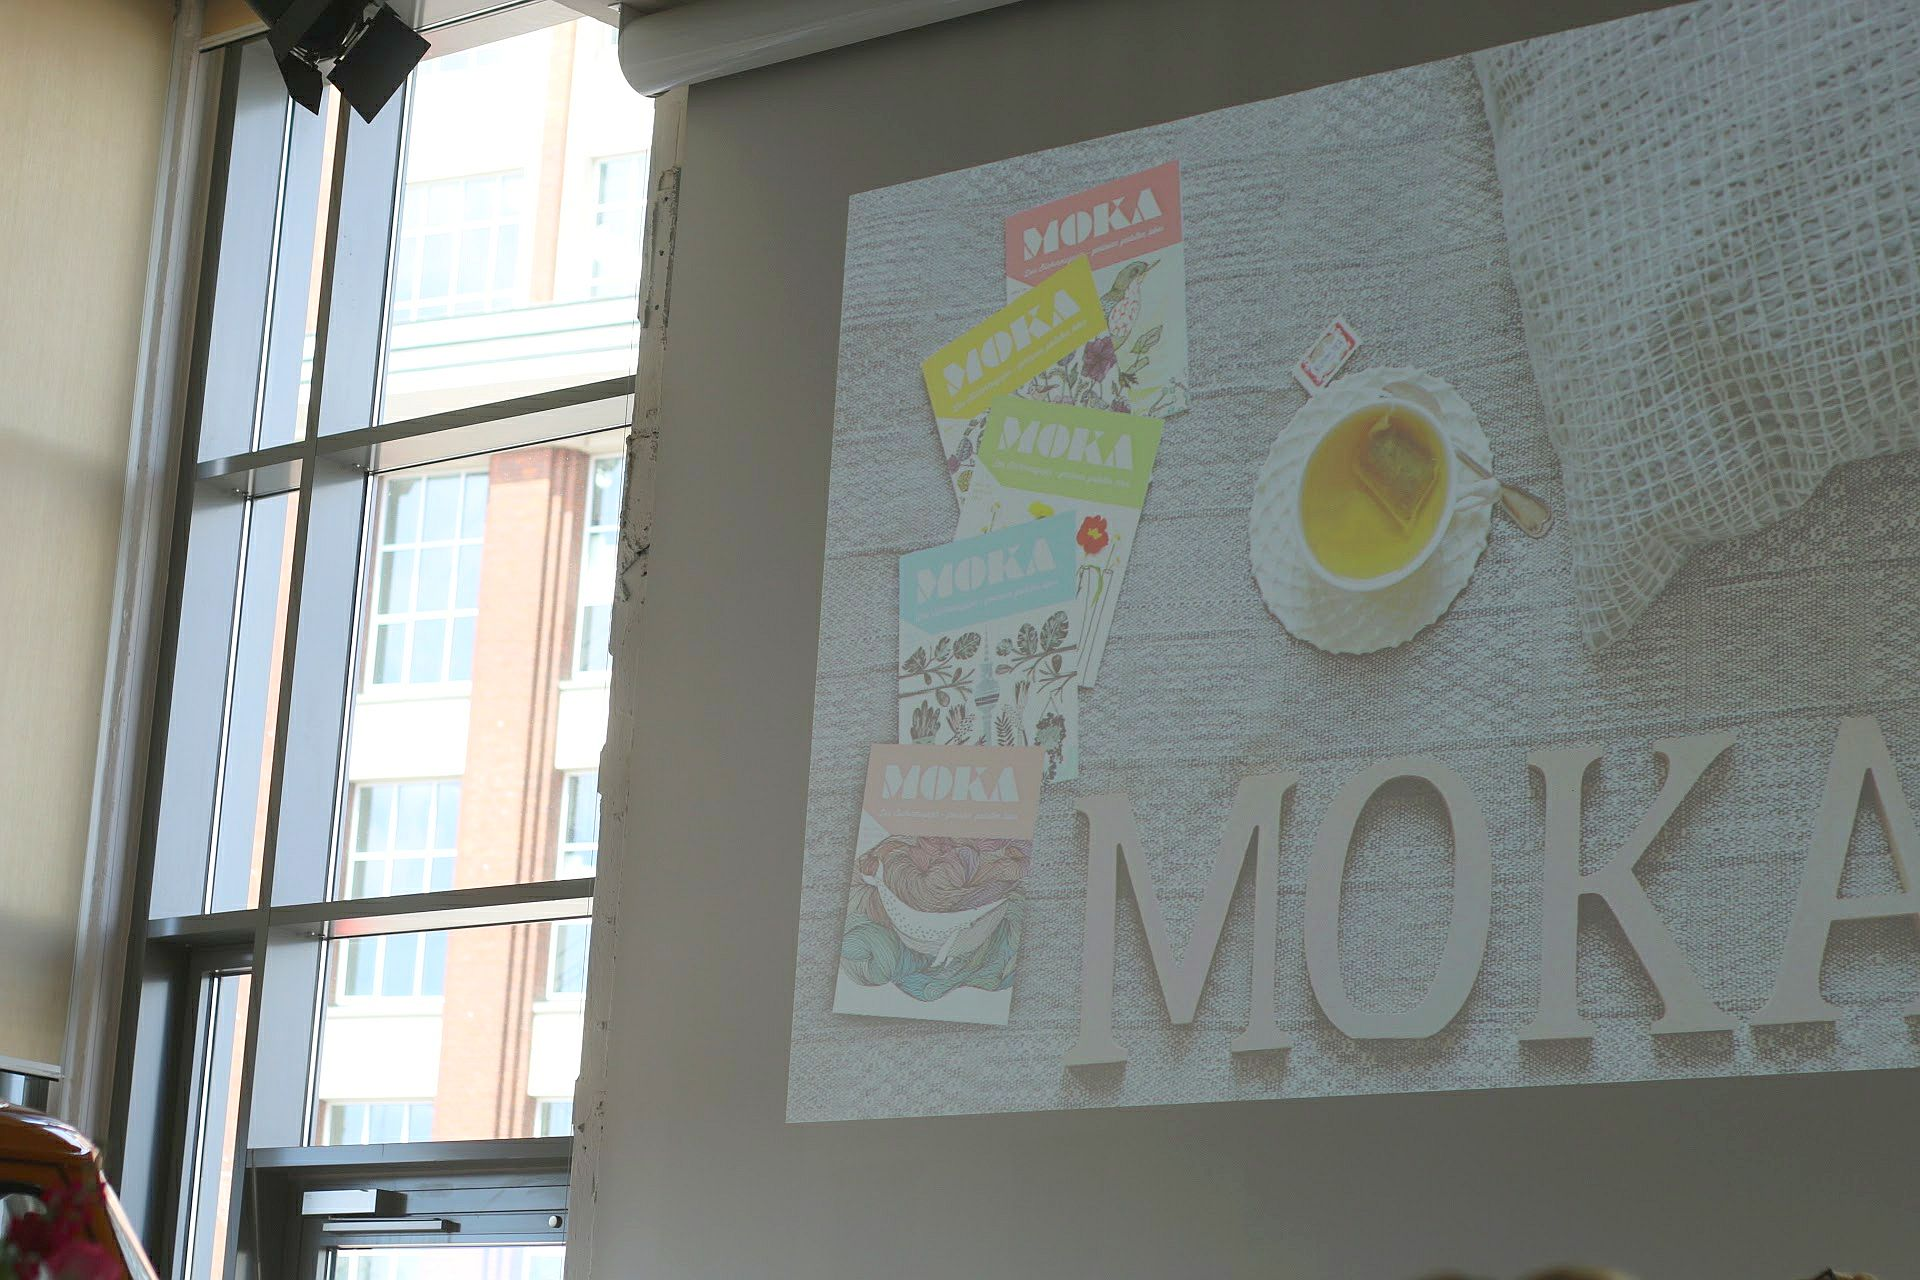 LitBlog Convention 2017 MOKA Vortrag